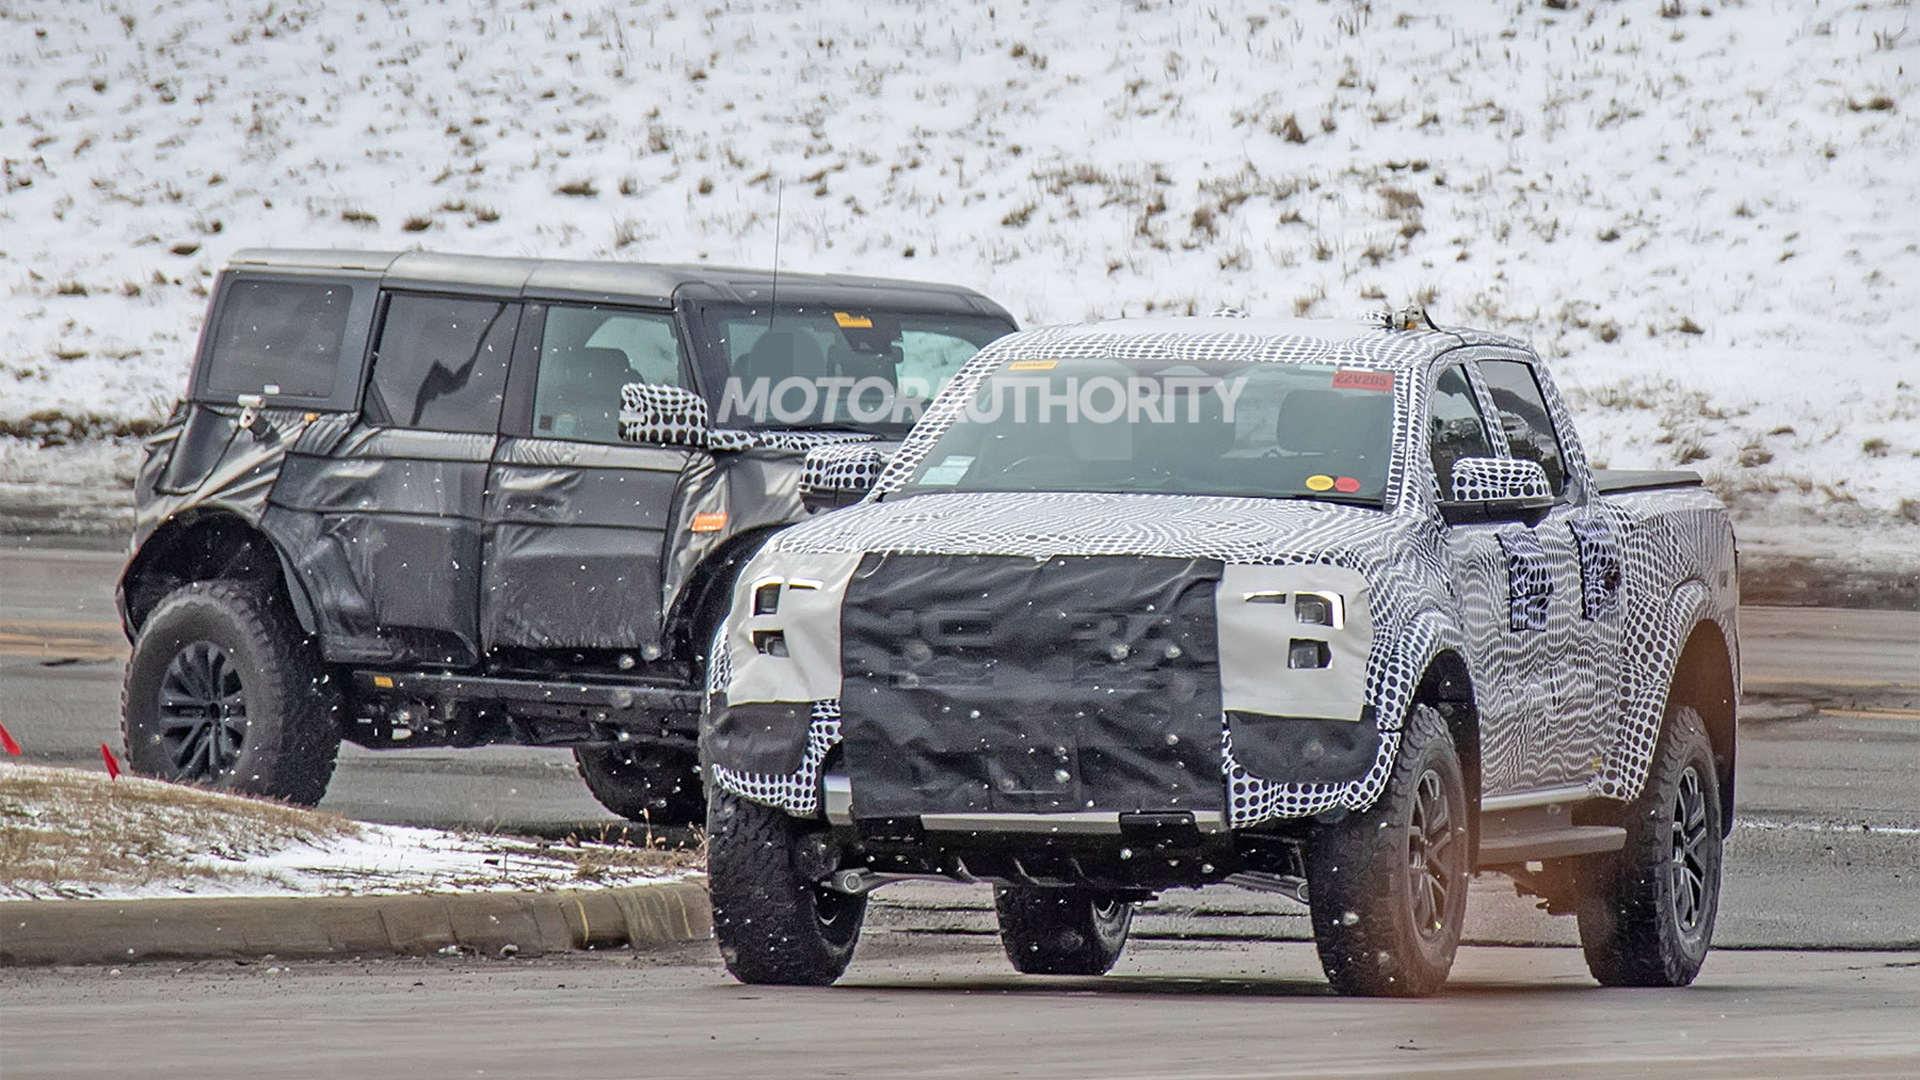 2022 Ford Ranger Raptor spy shots - Photo credit:S. Baldauf/SB-Medien